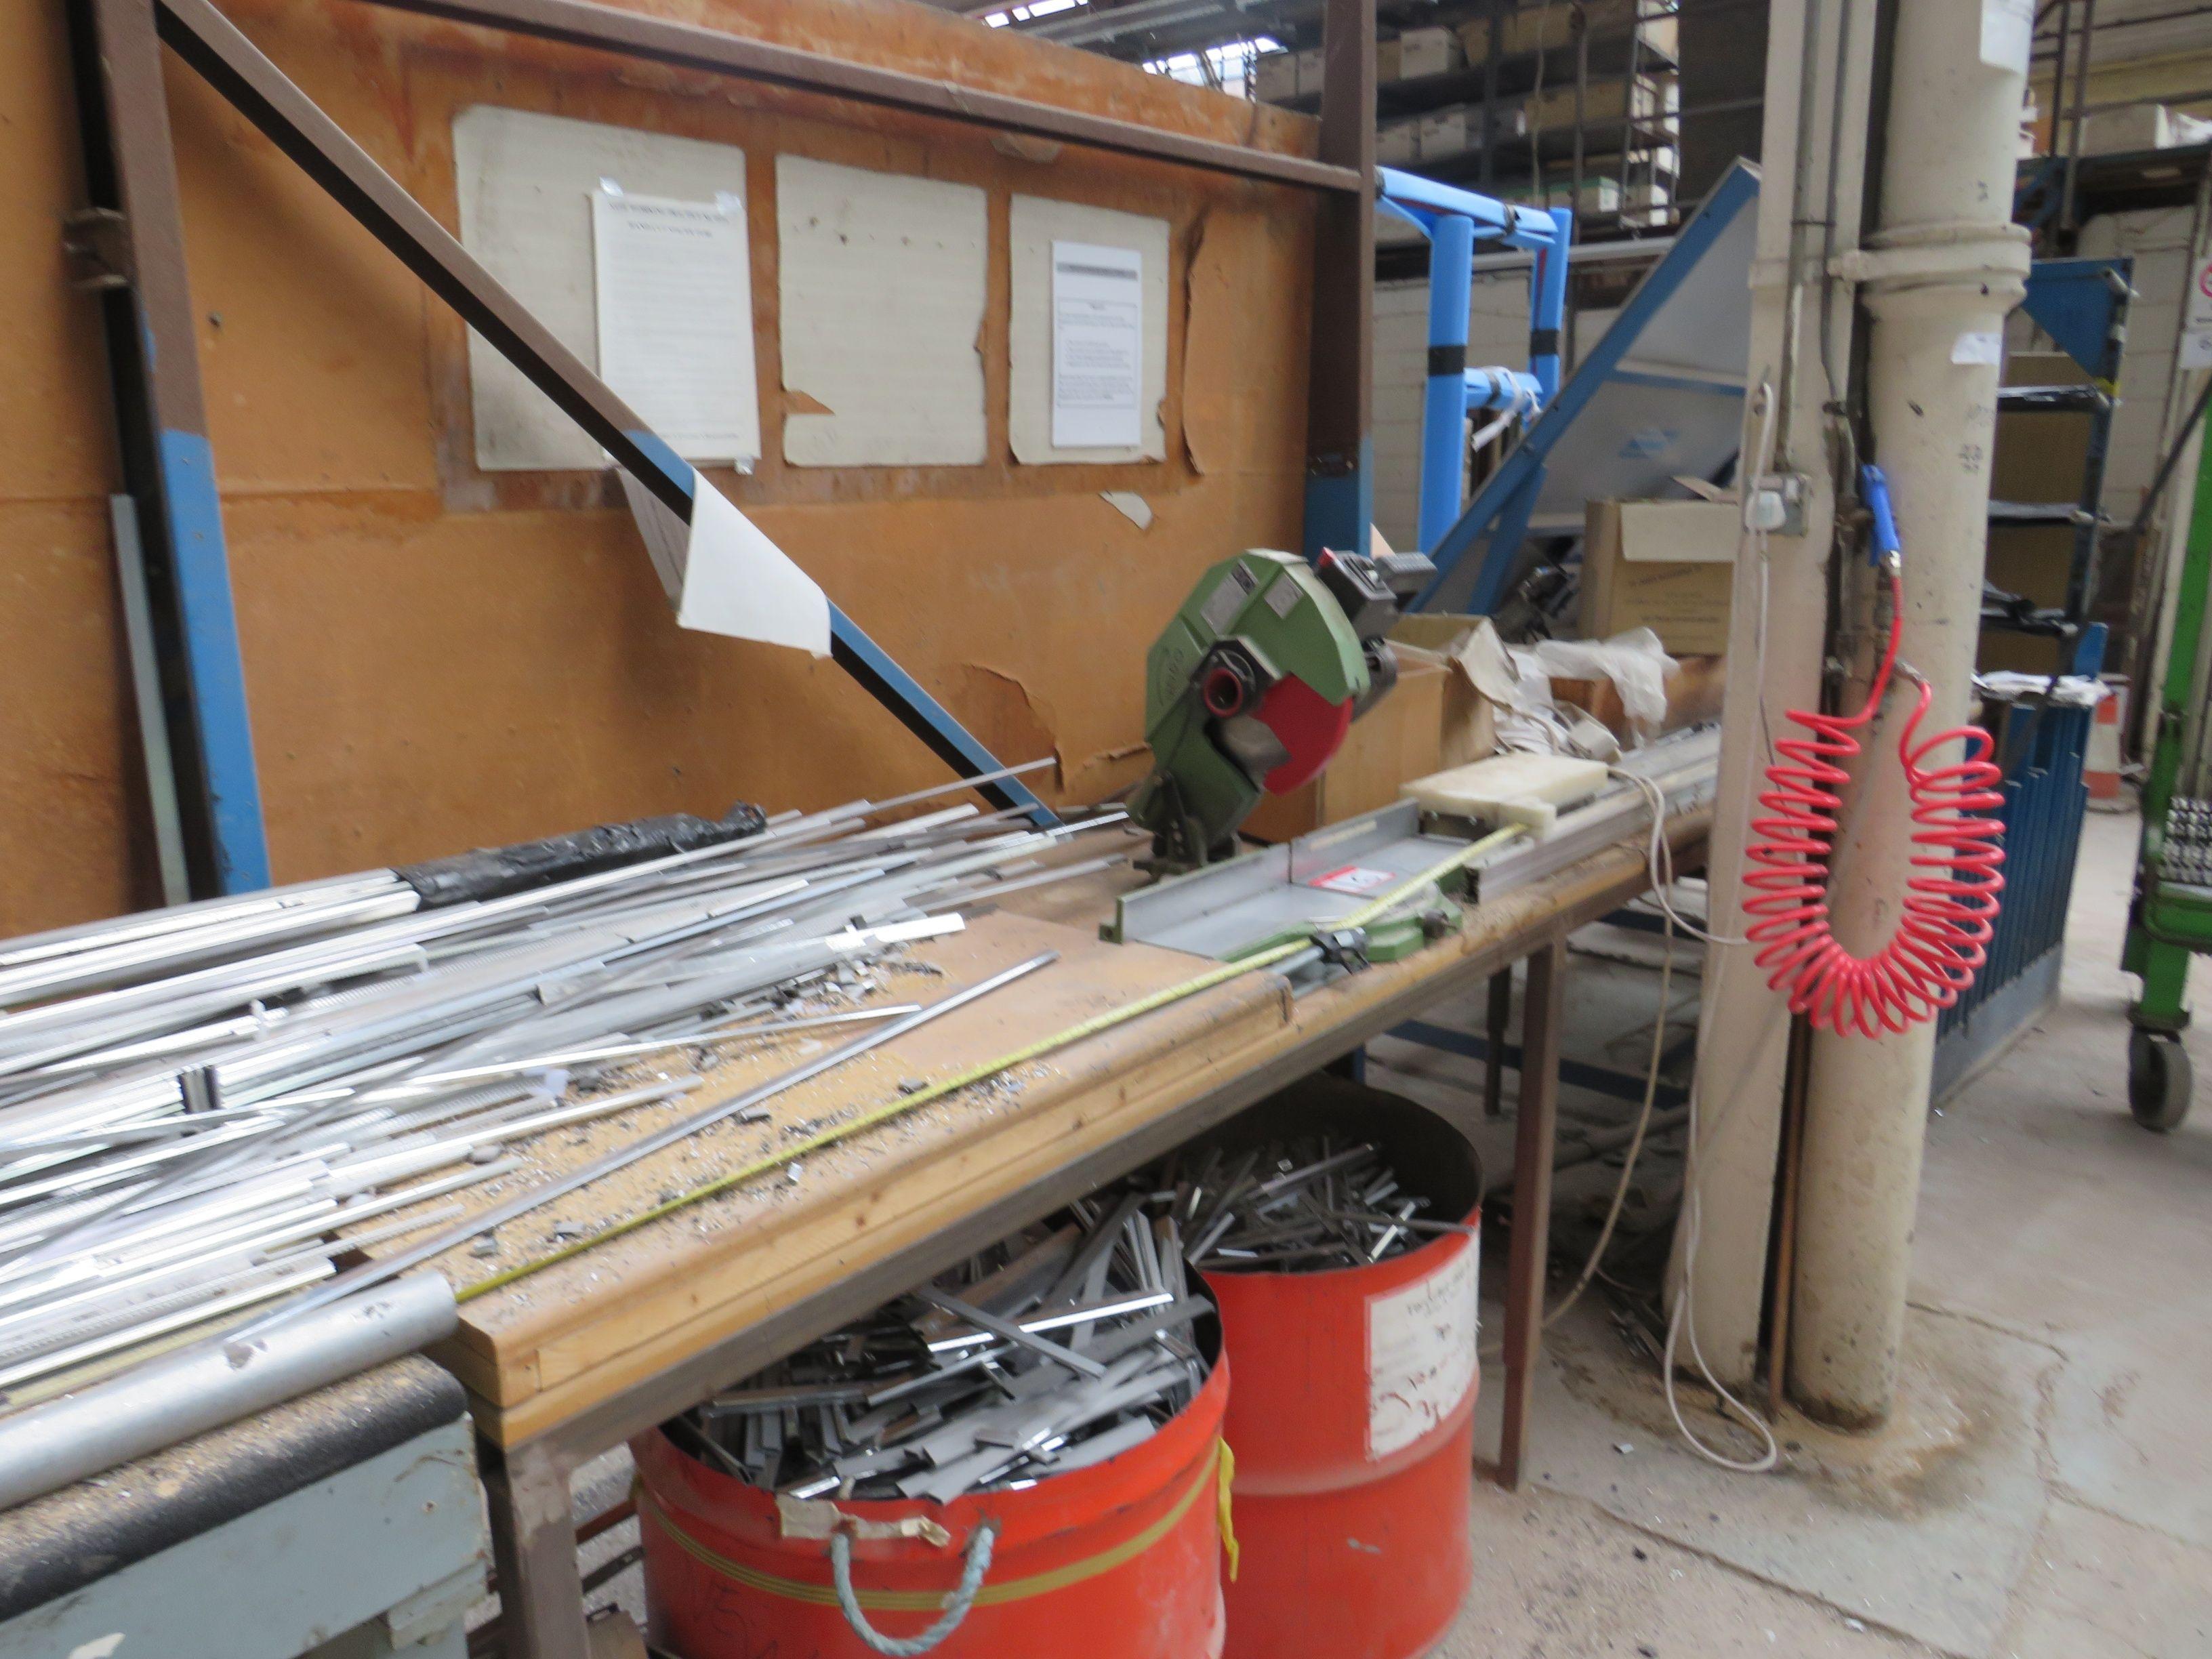 Pegic Bench Mounted Cut Off Saw